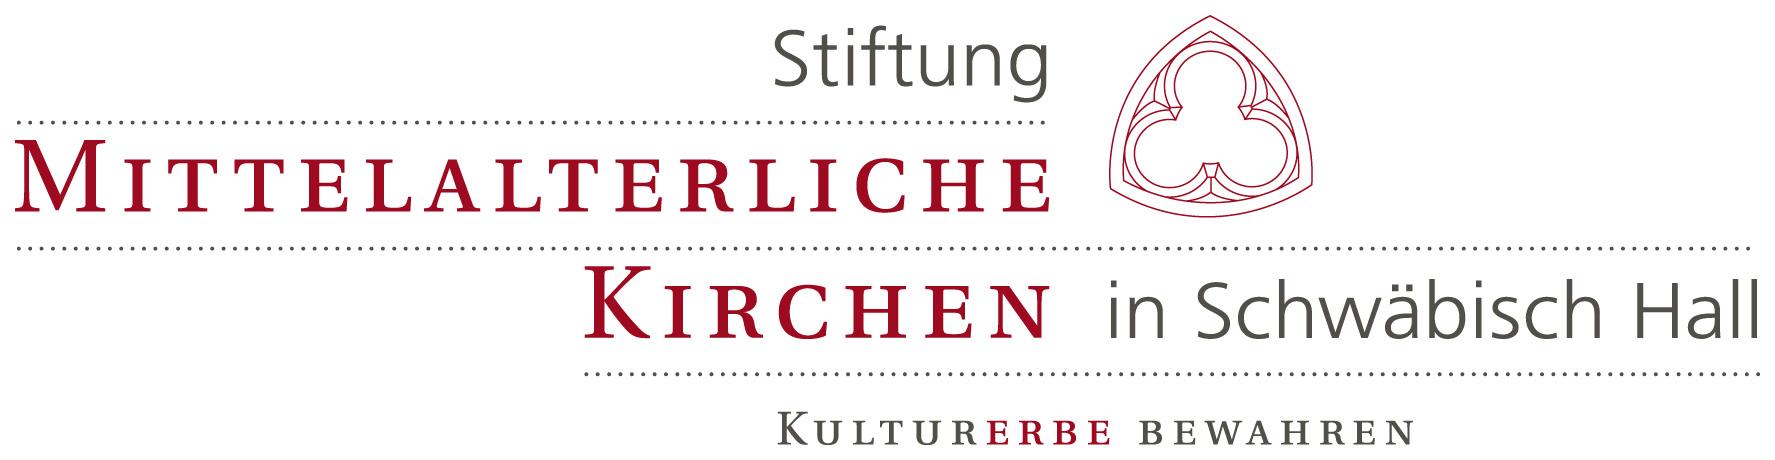 2010-Signet-Stiftung-MaK